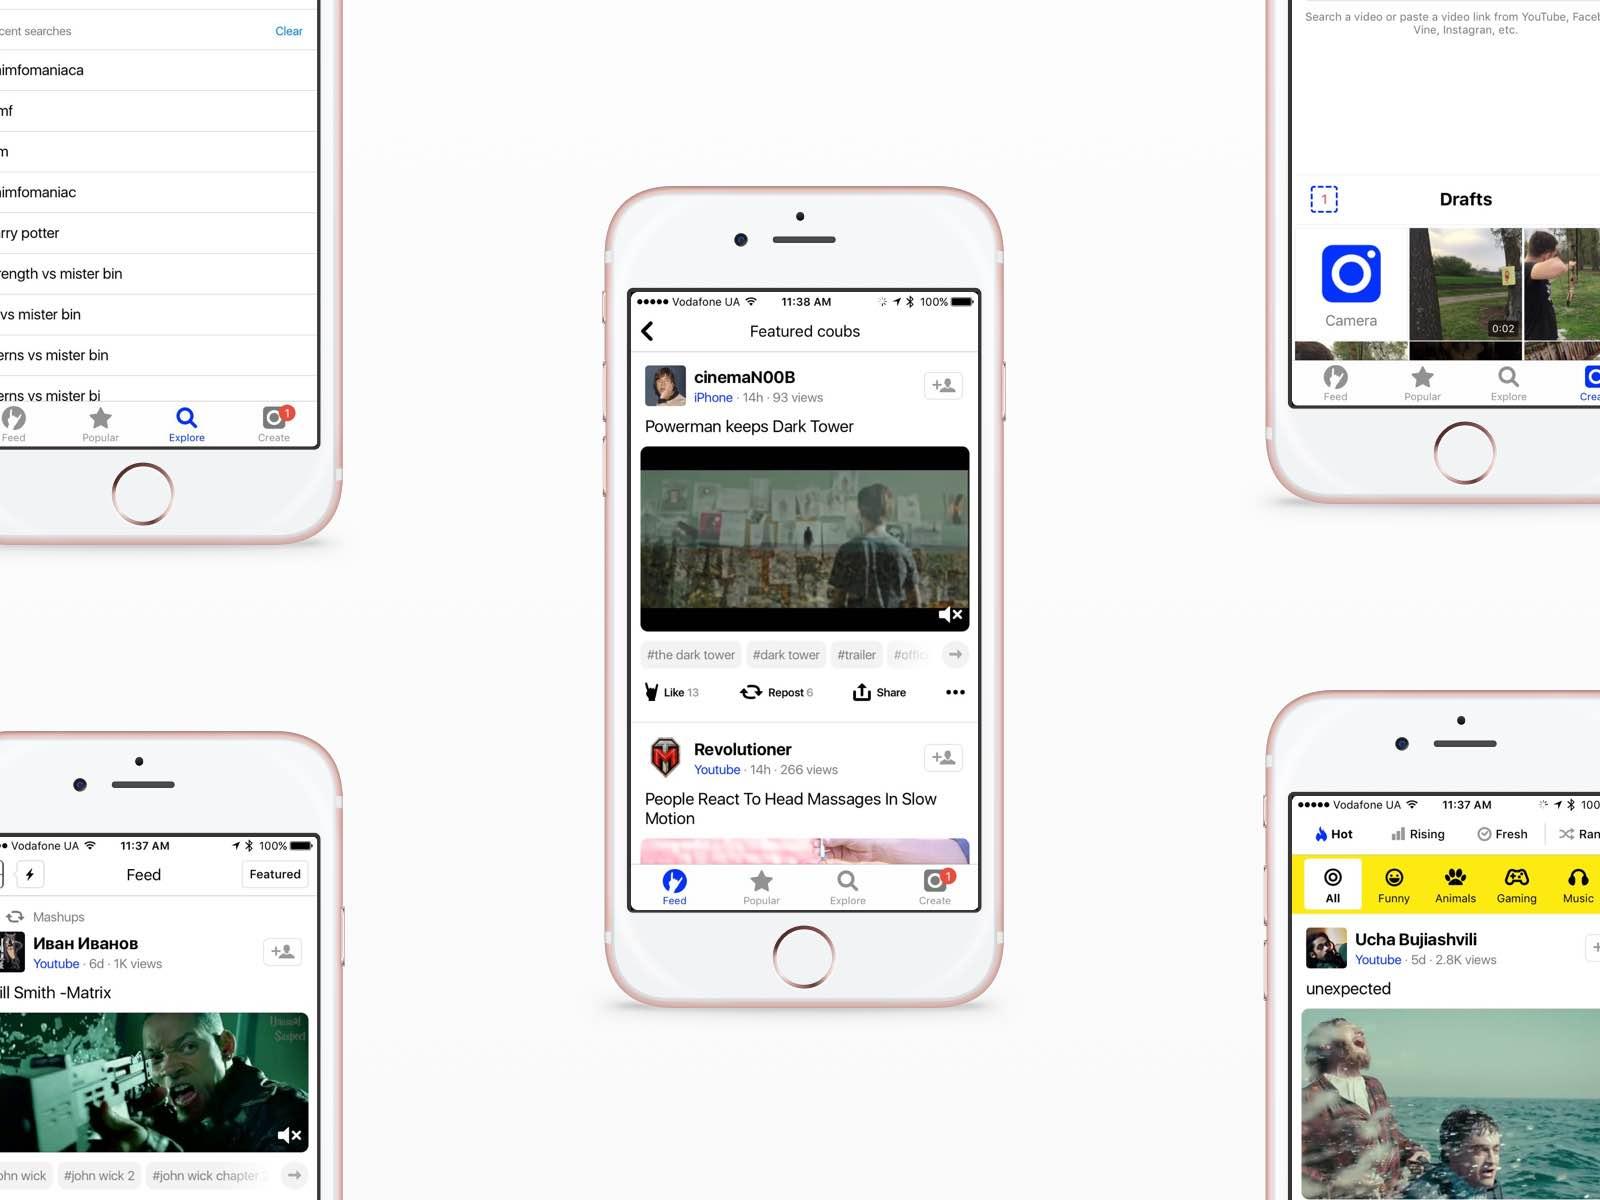 iOS design differences